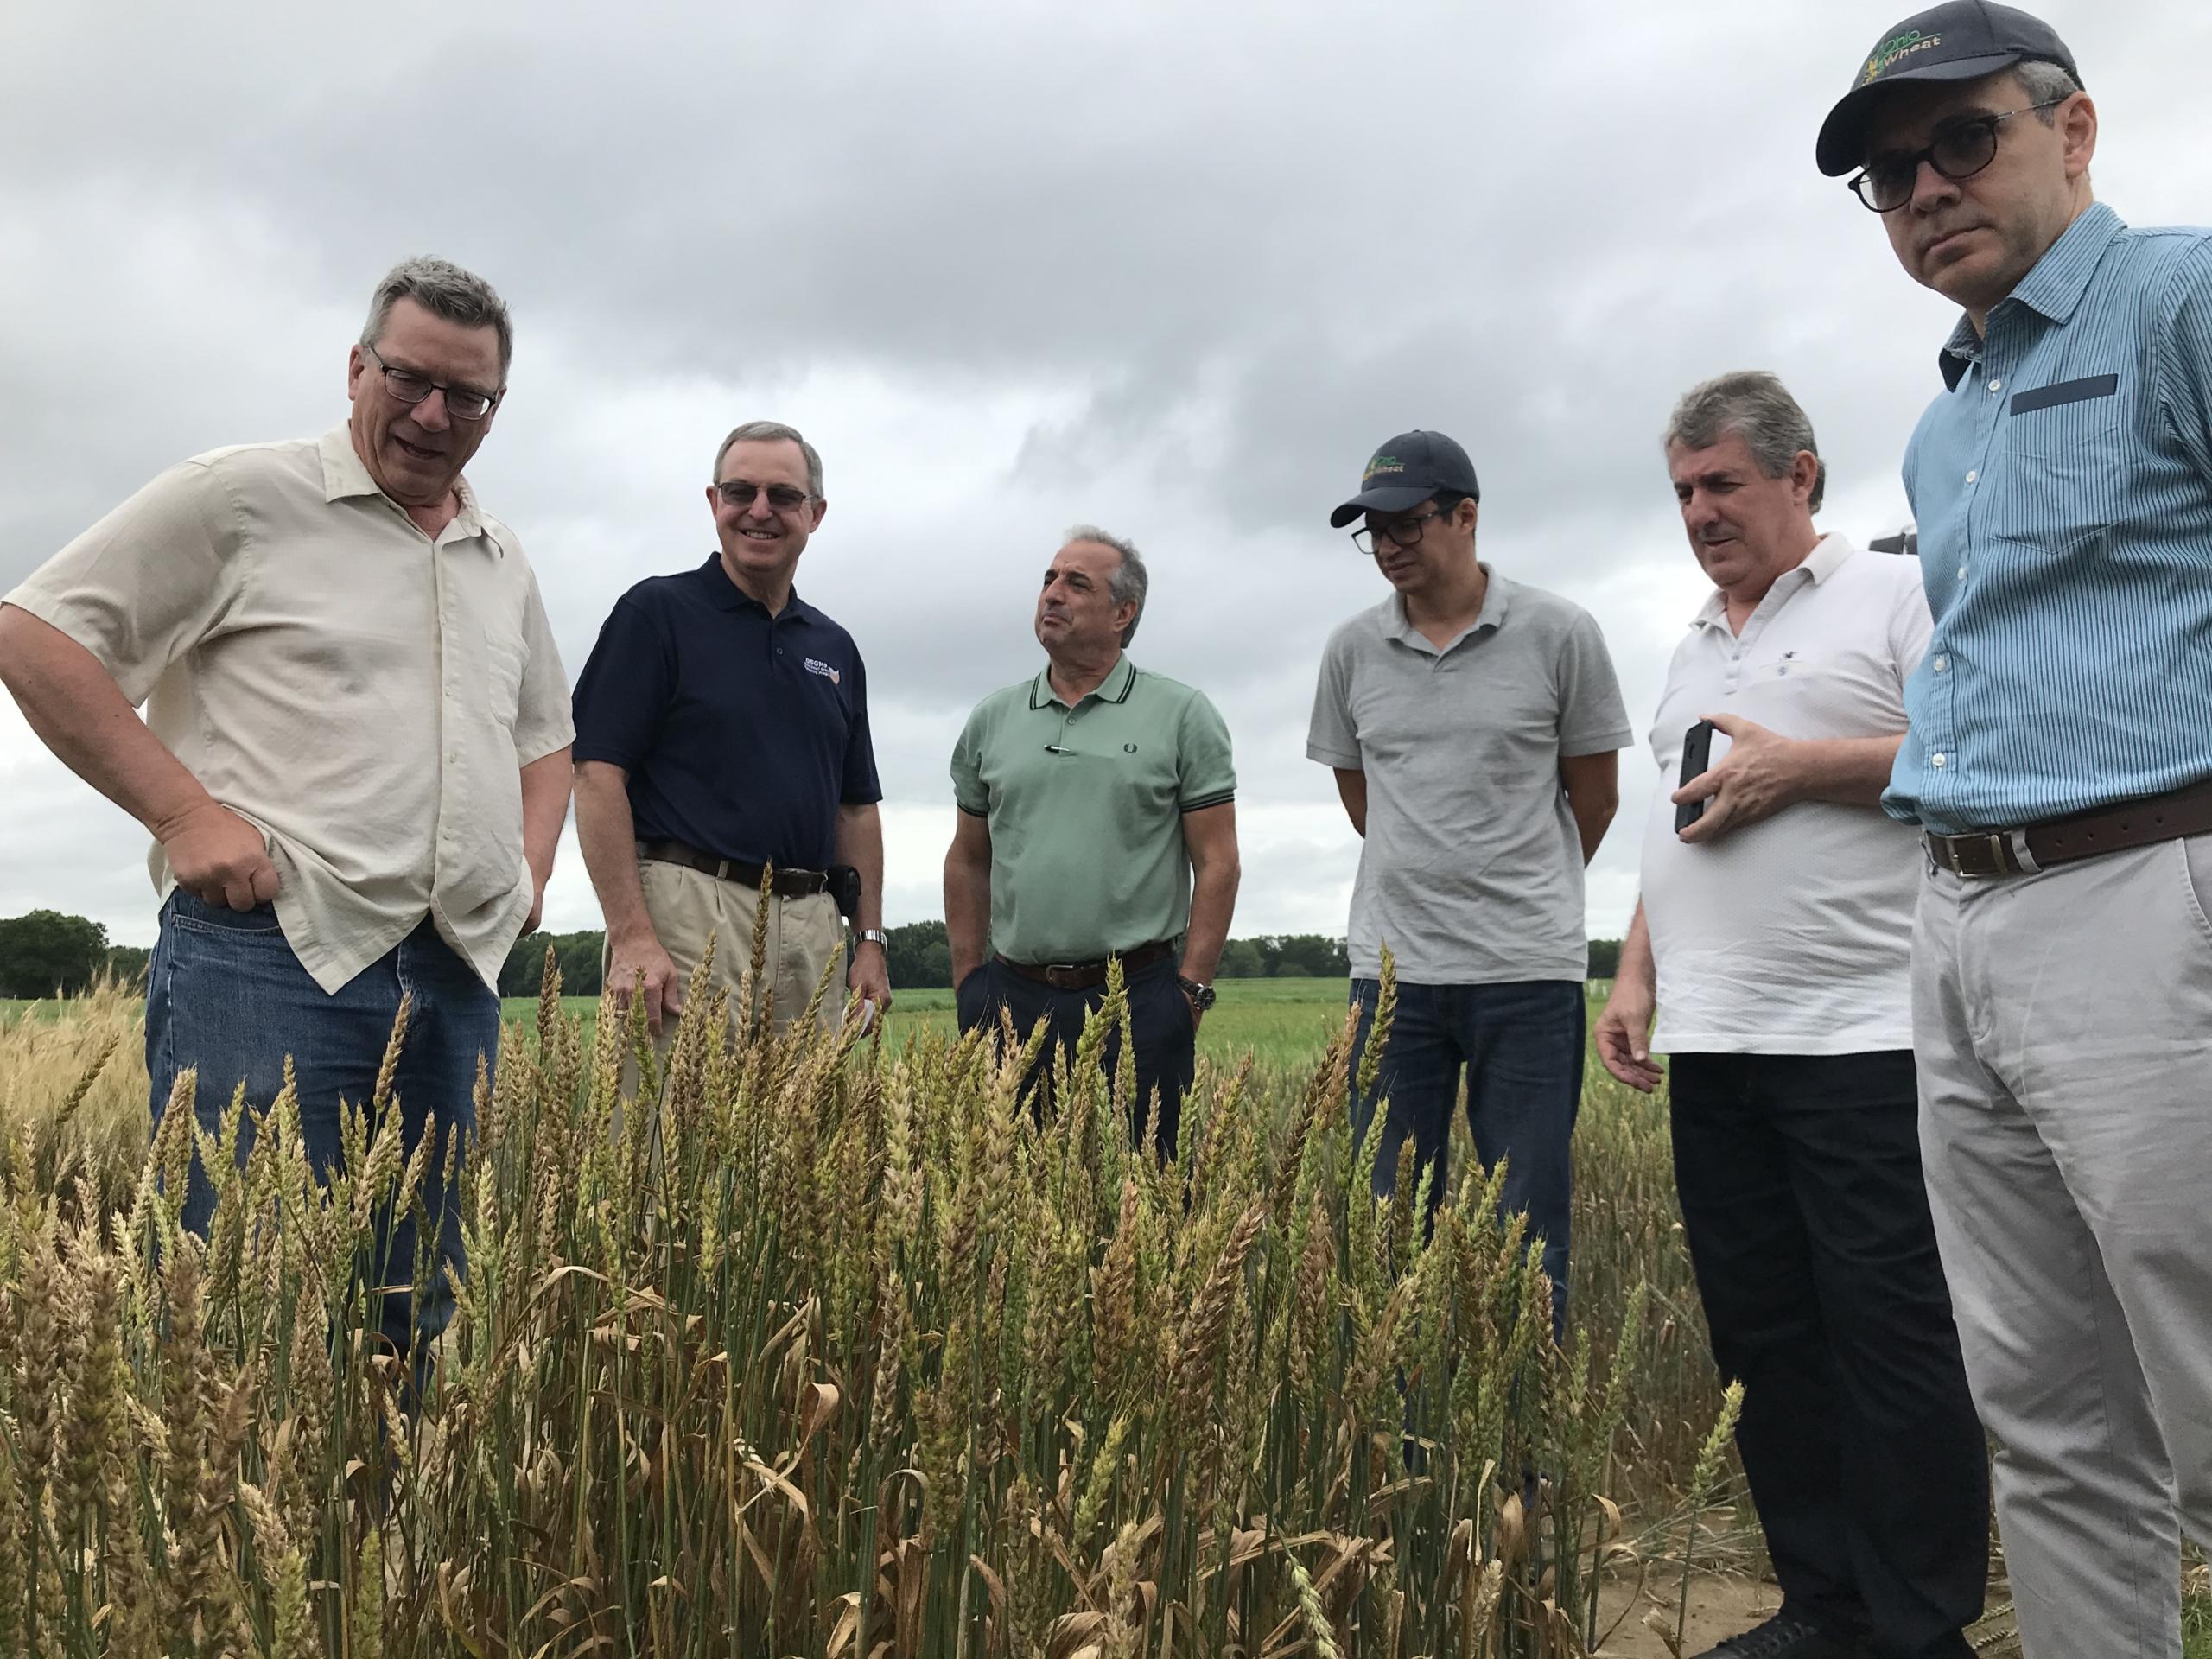 Ohio's public wheat breeding program